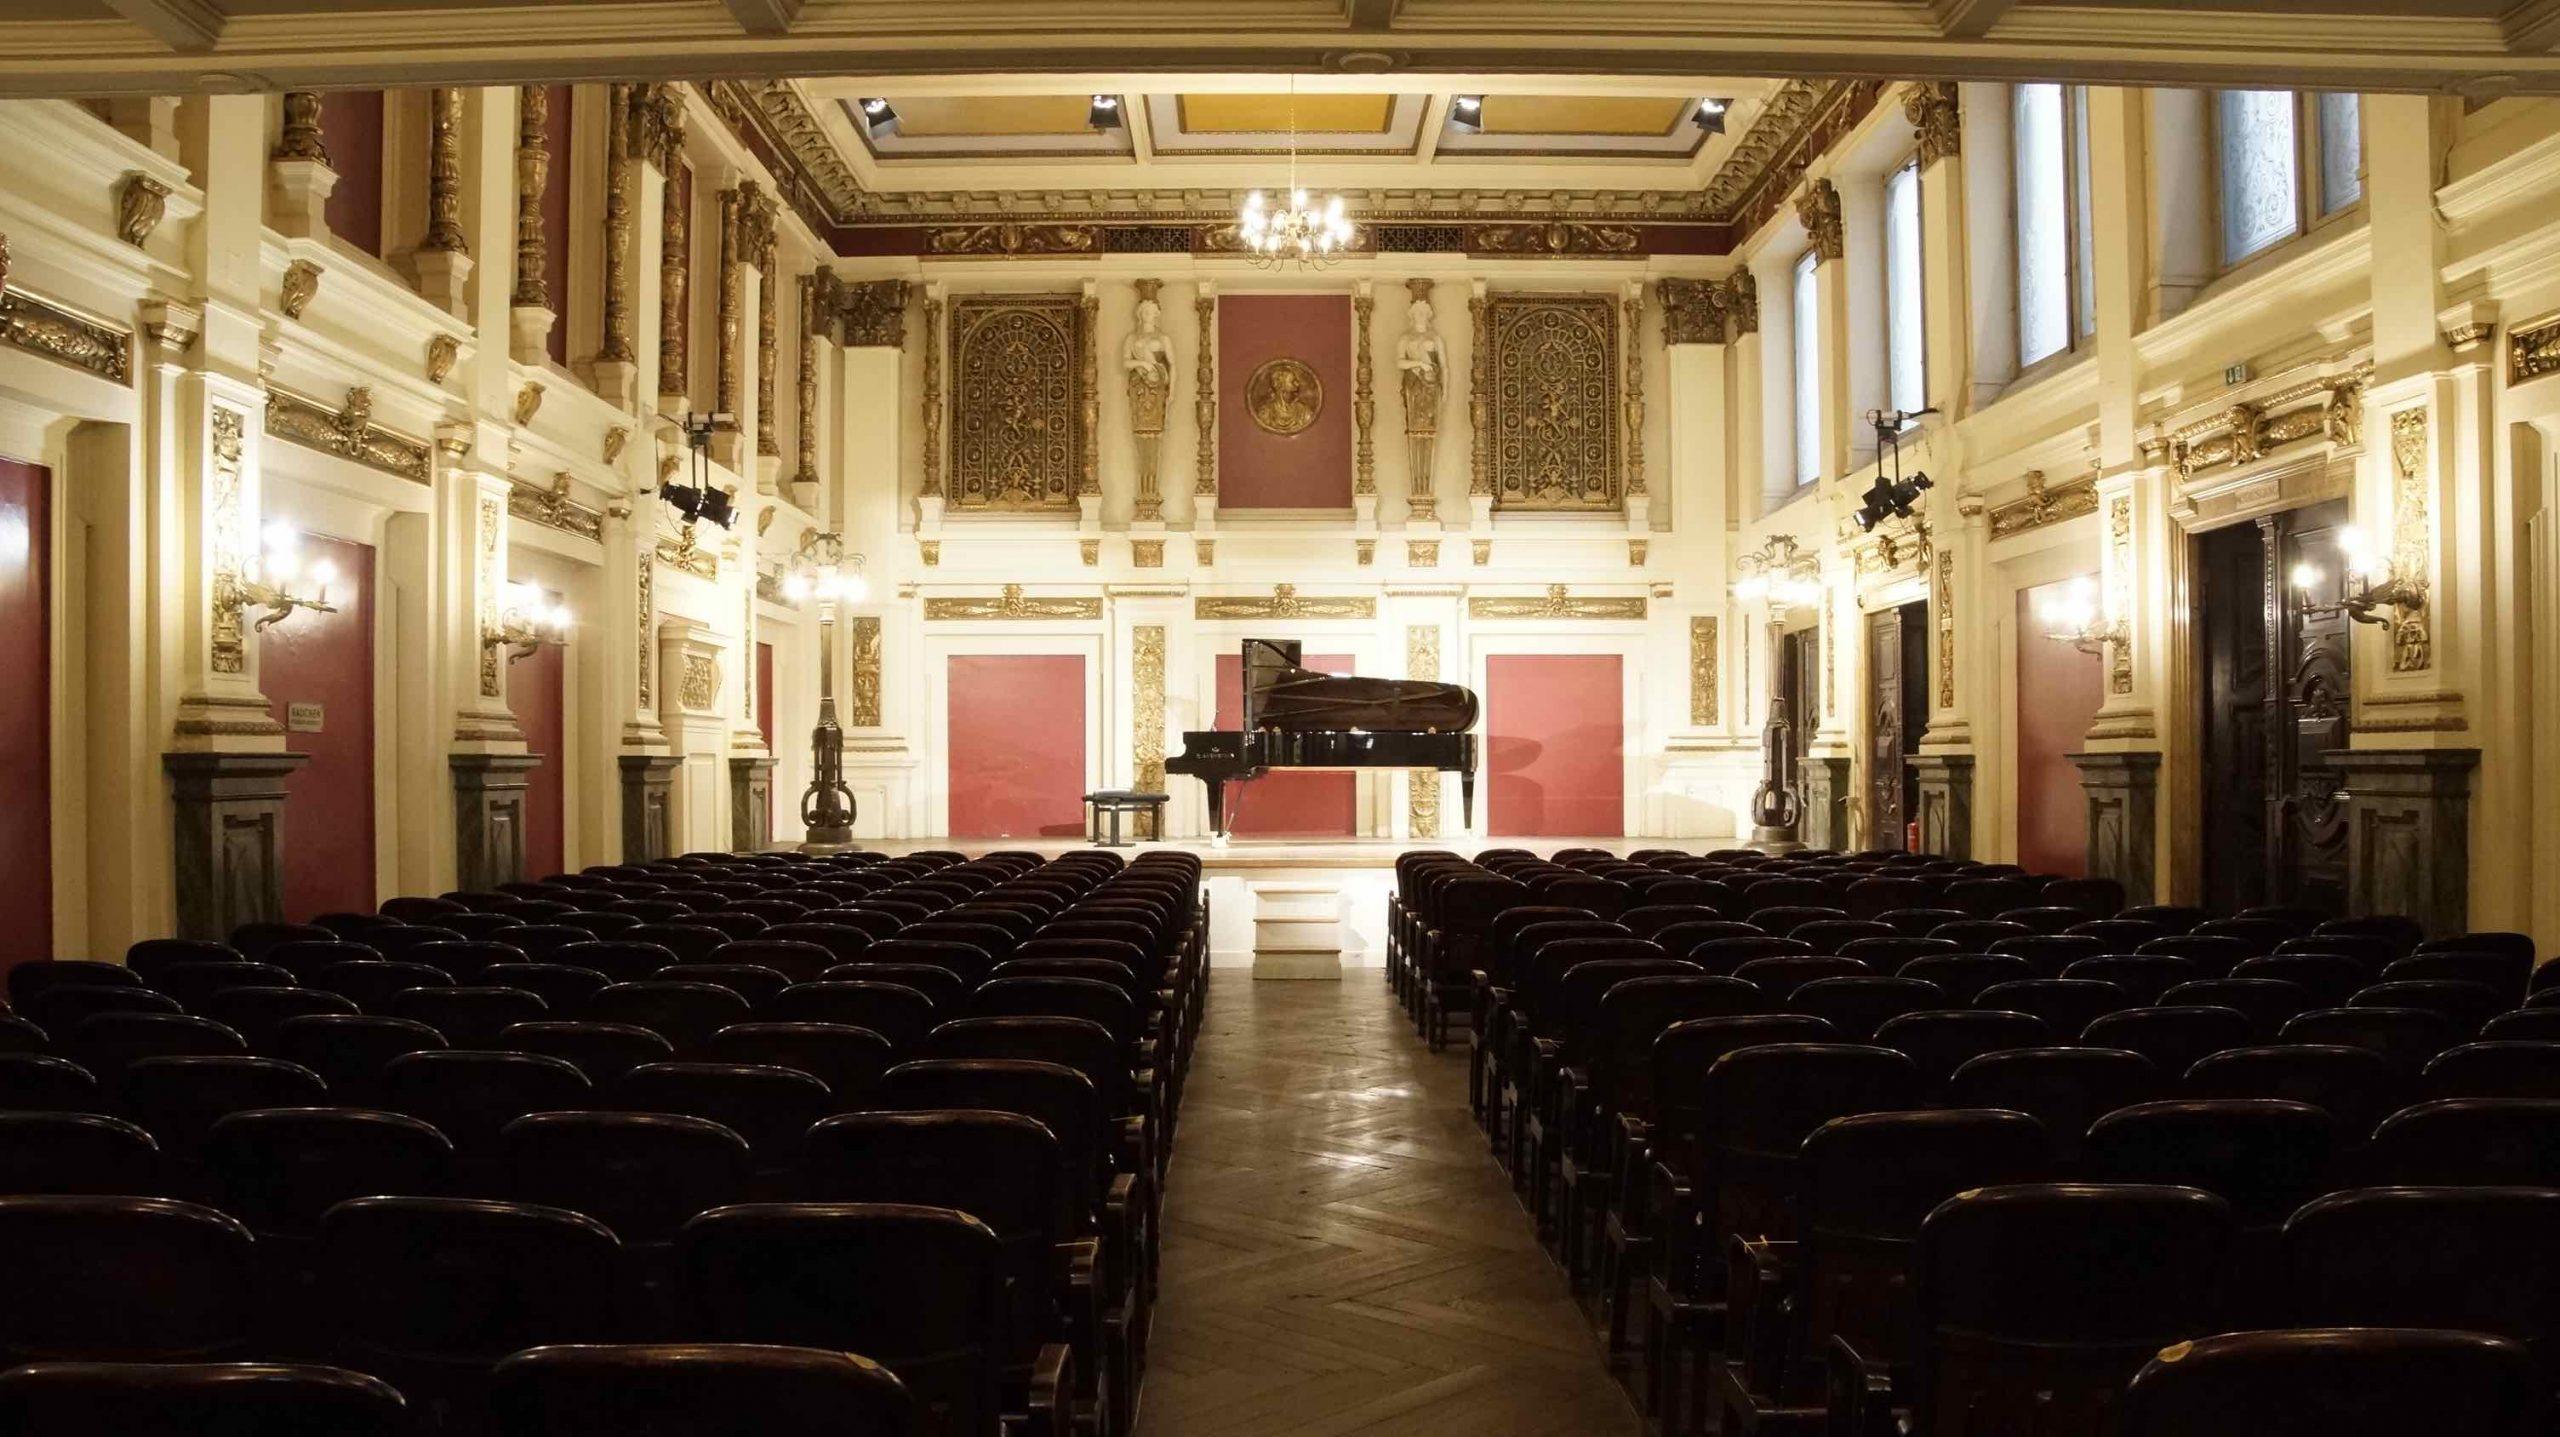 Ehrbar Saal Austria Konzerte Wien